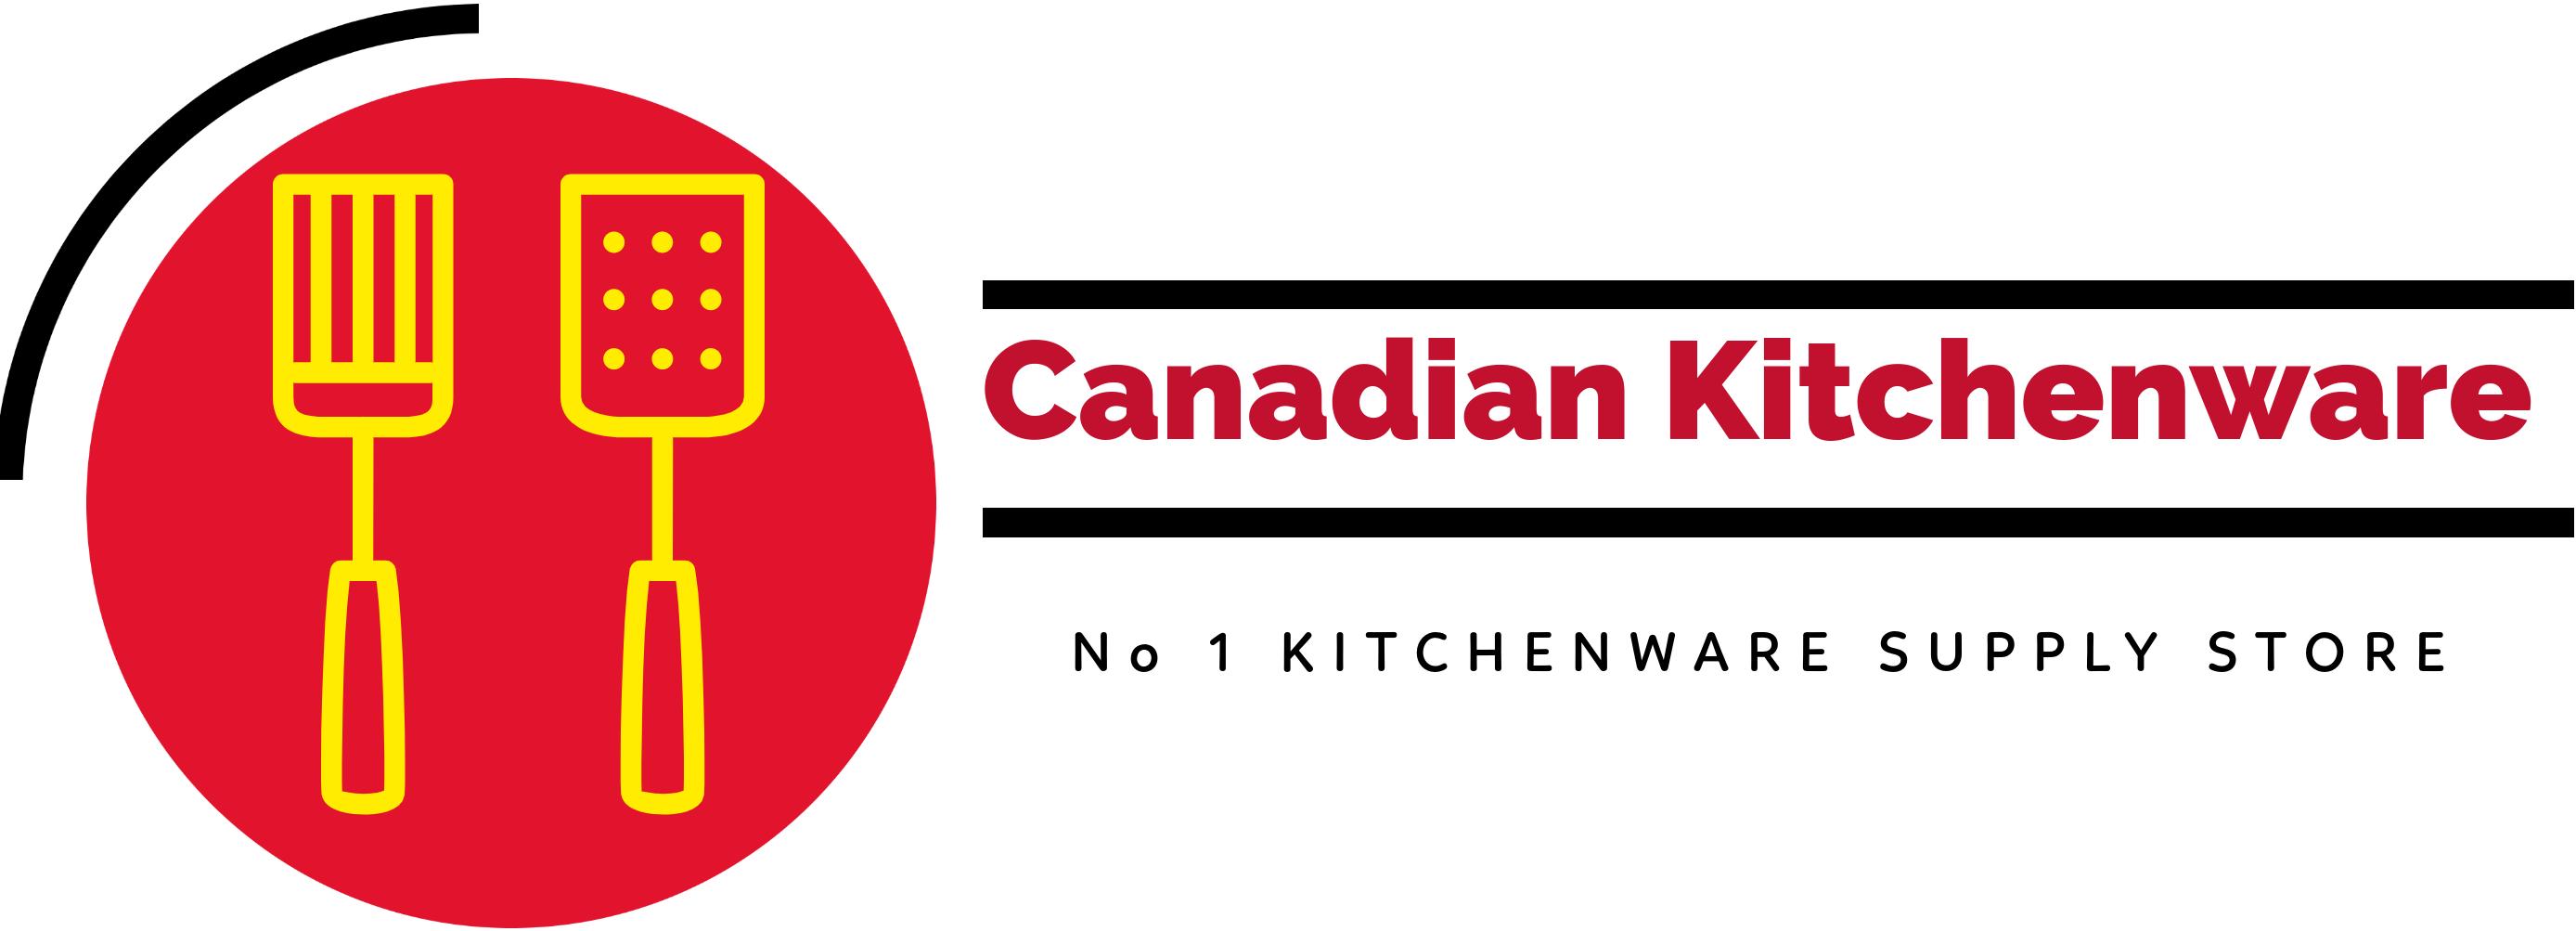 Canadian Kitchenware